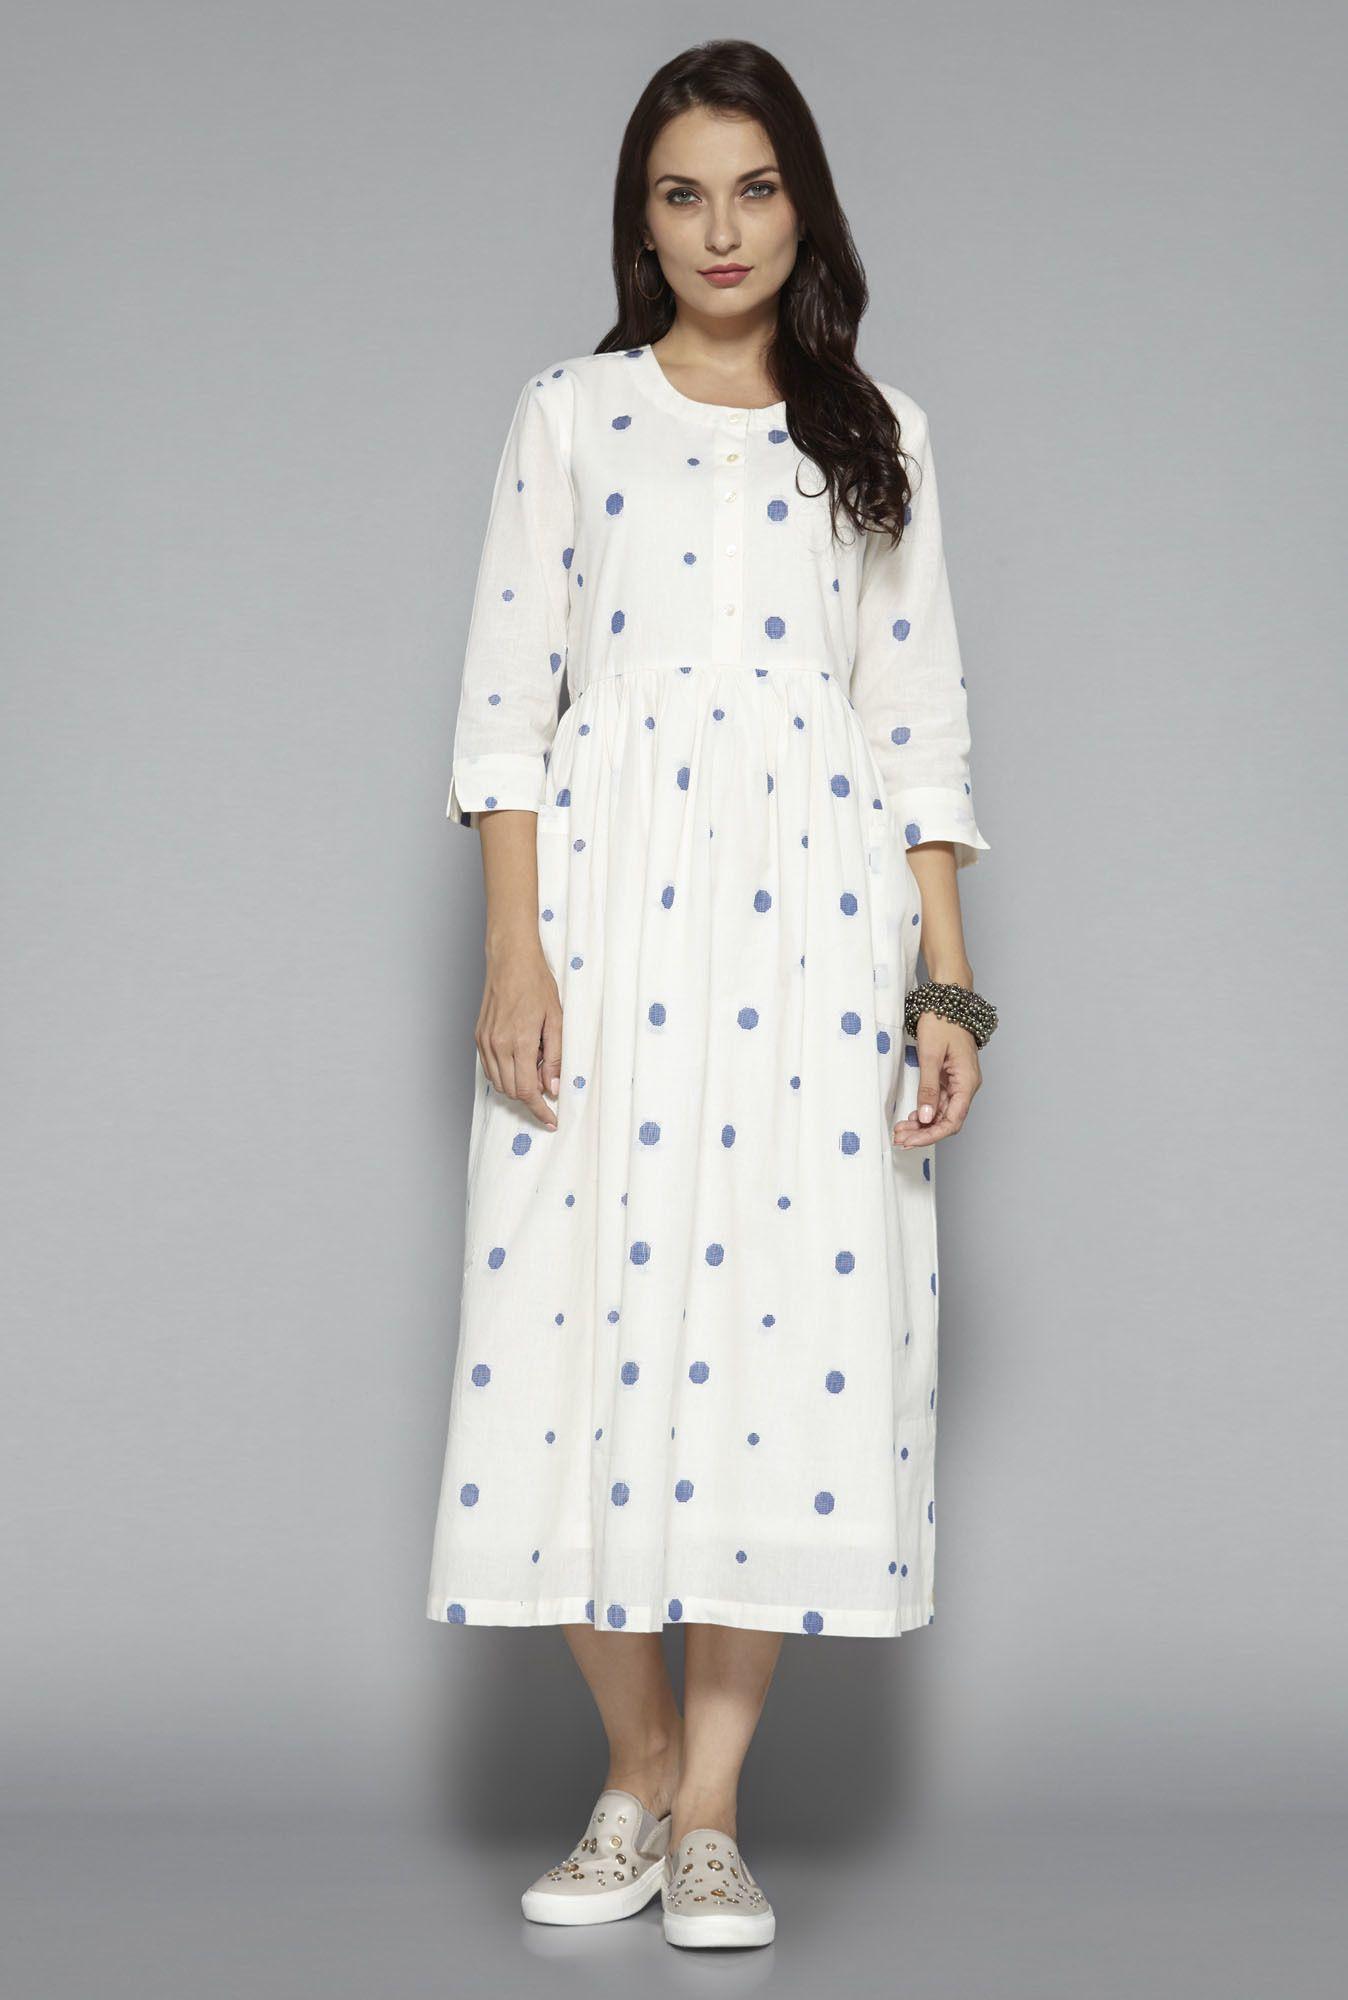 Bombay Paisley by Westside Off White Polka Dot Dress | Kurta | Pinterest